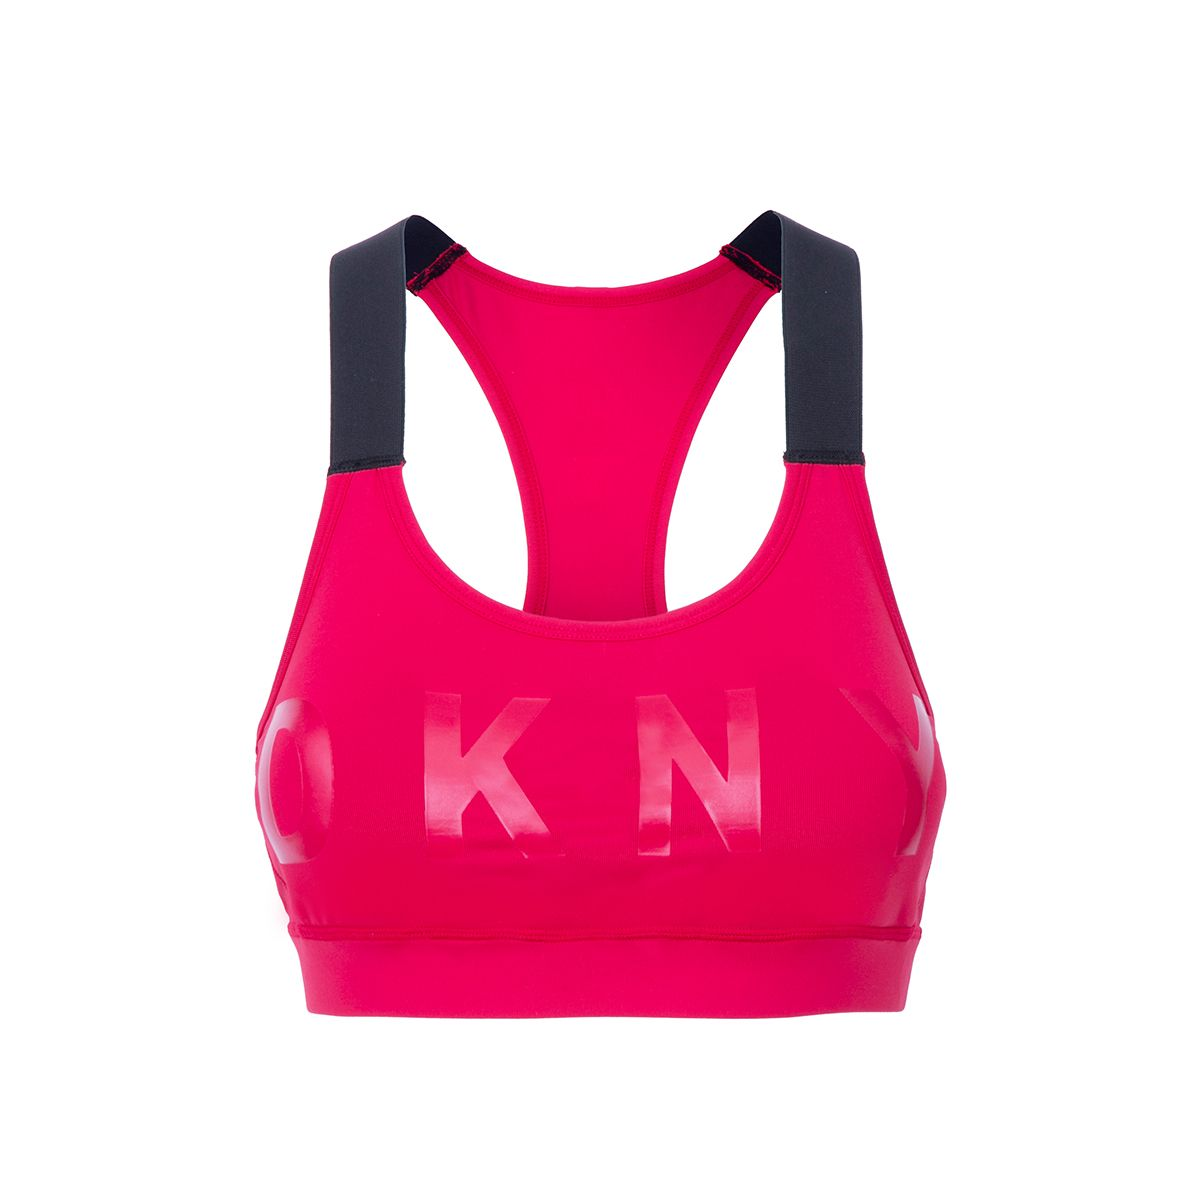 860c064eec S DKNY Dresses   Clothing for Women - Macy s